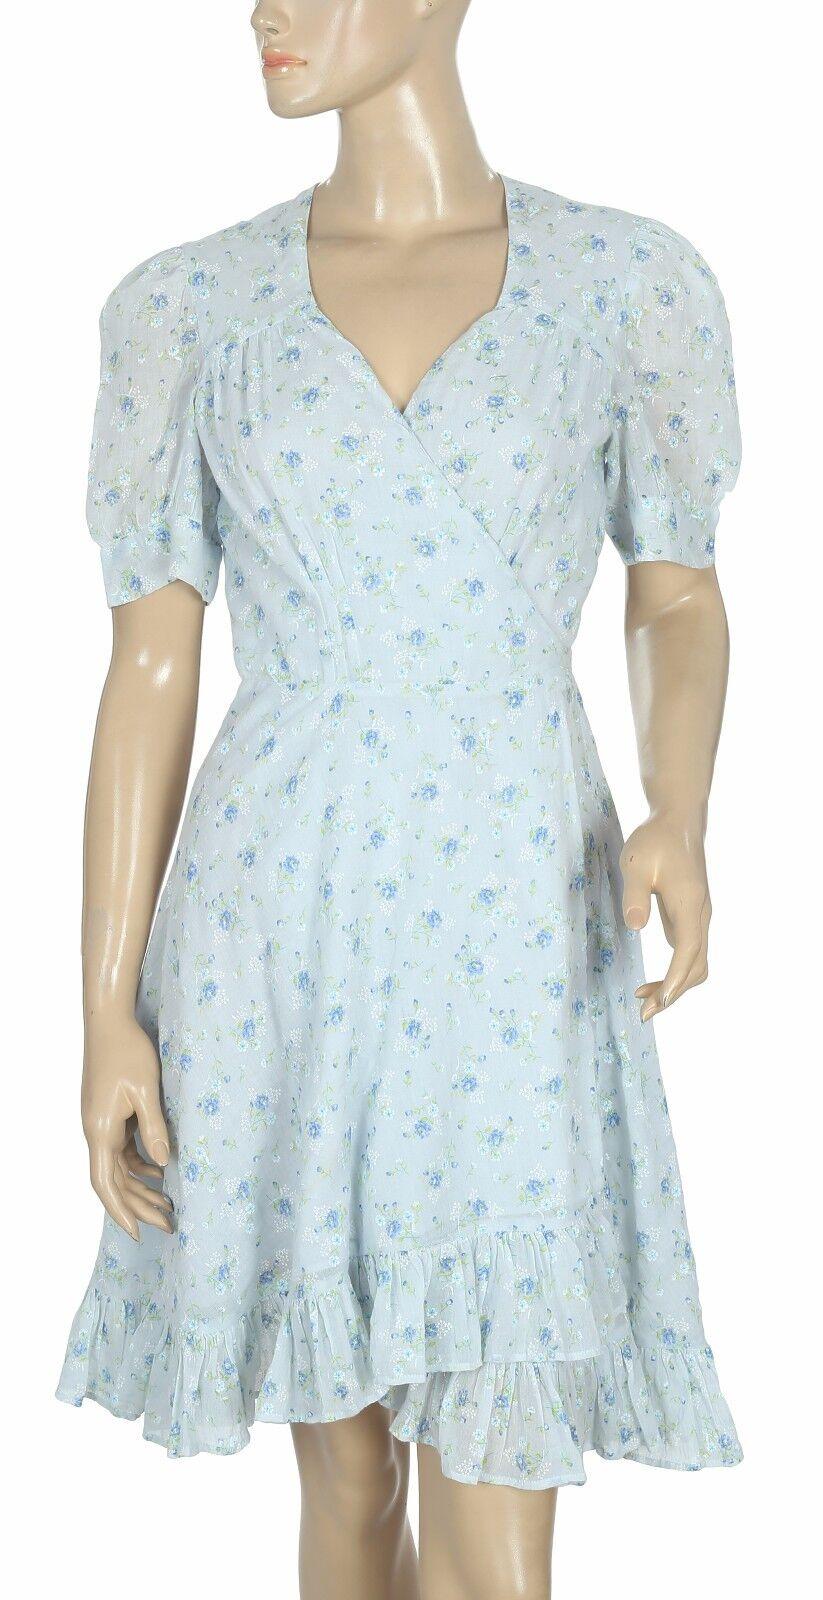 170289 New Denim & Supply Ralph Lauren Floral Printed Wrap Coverup Dress XS